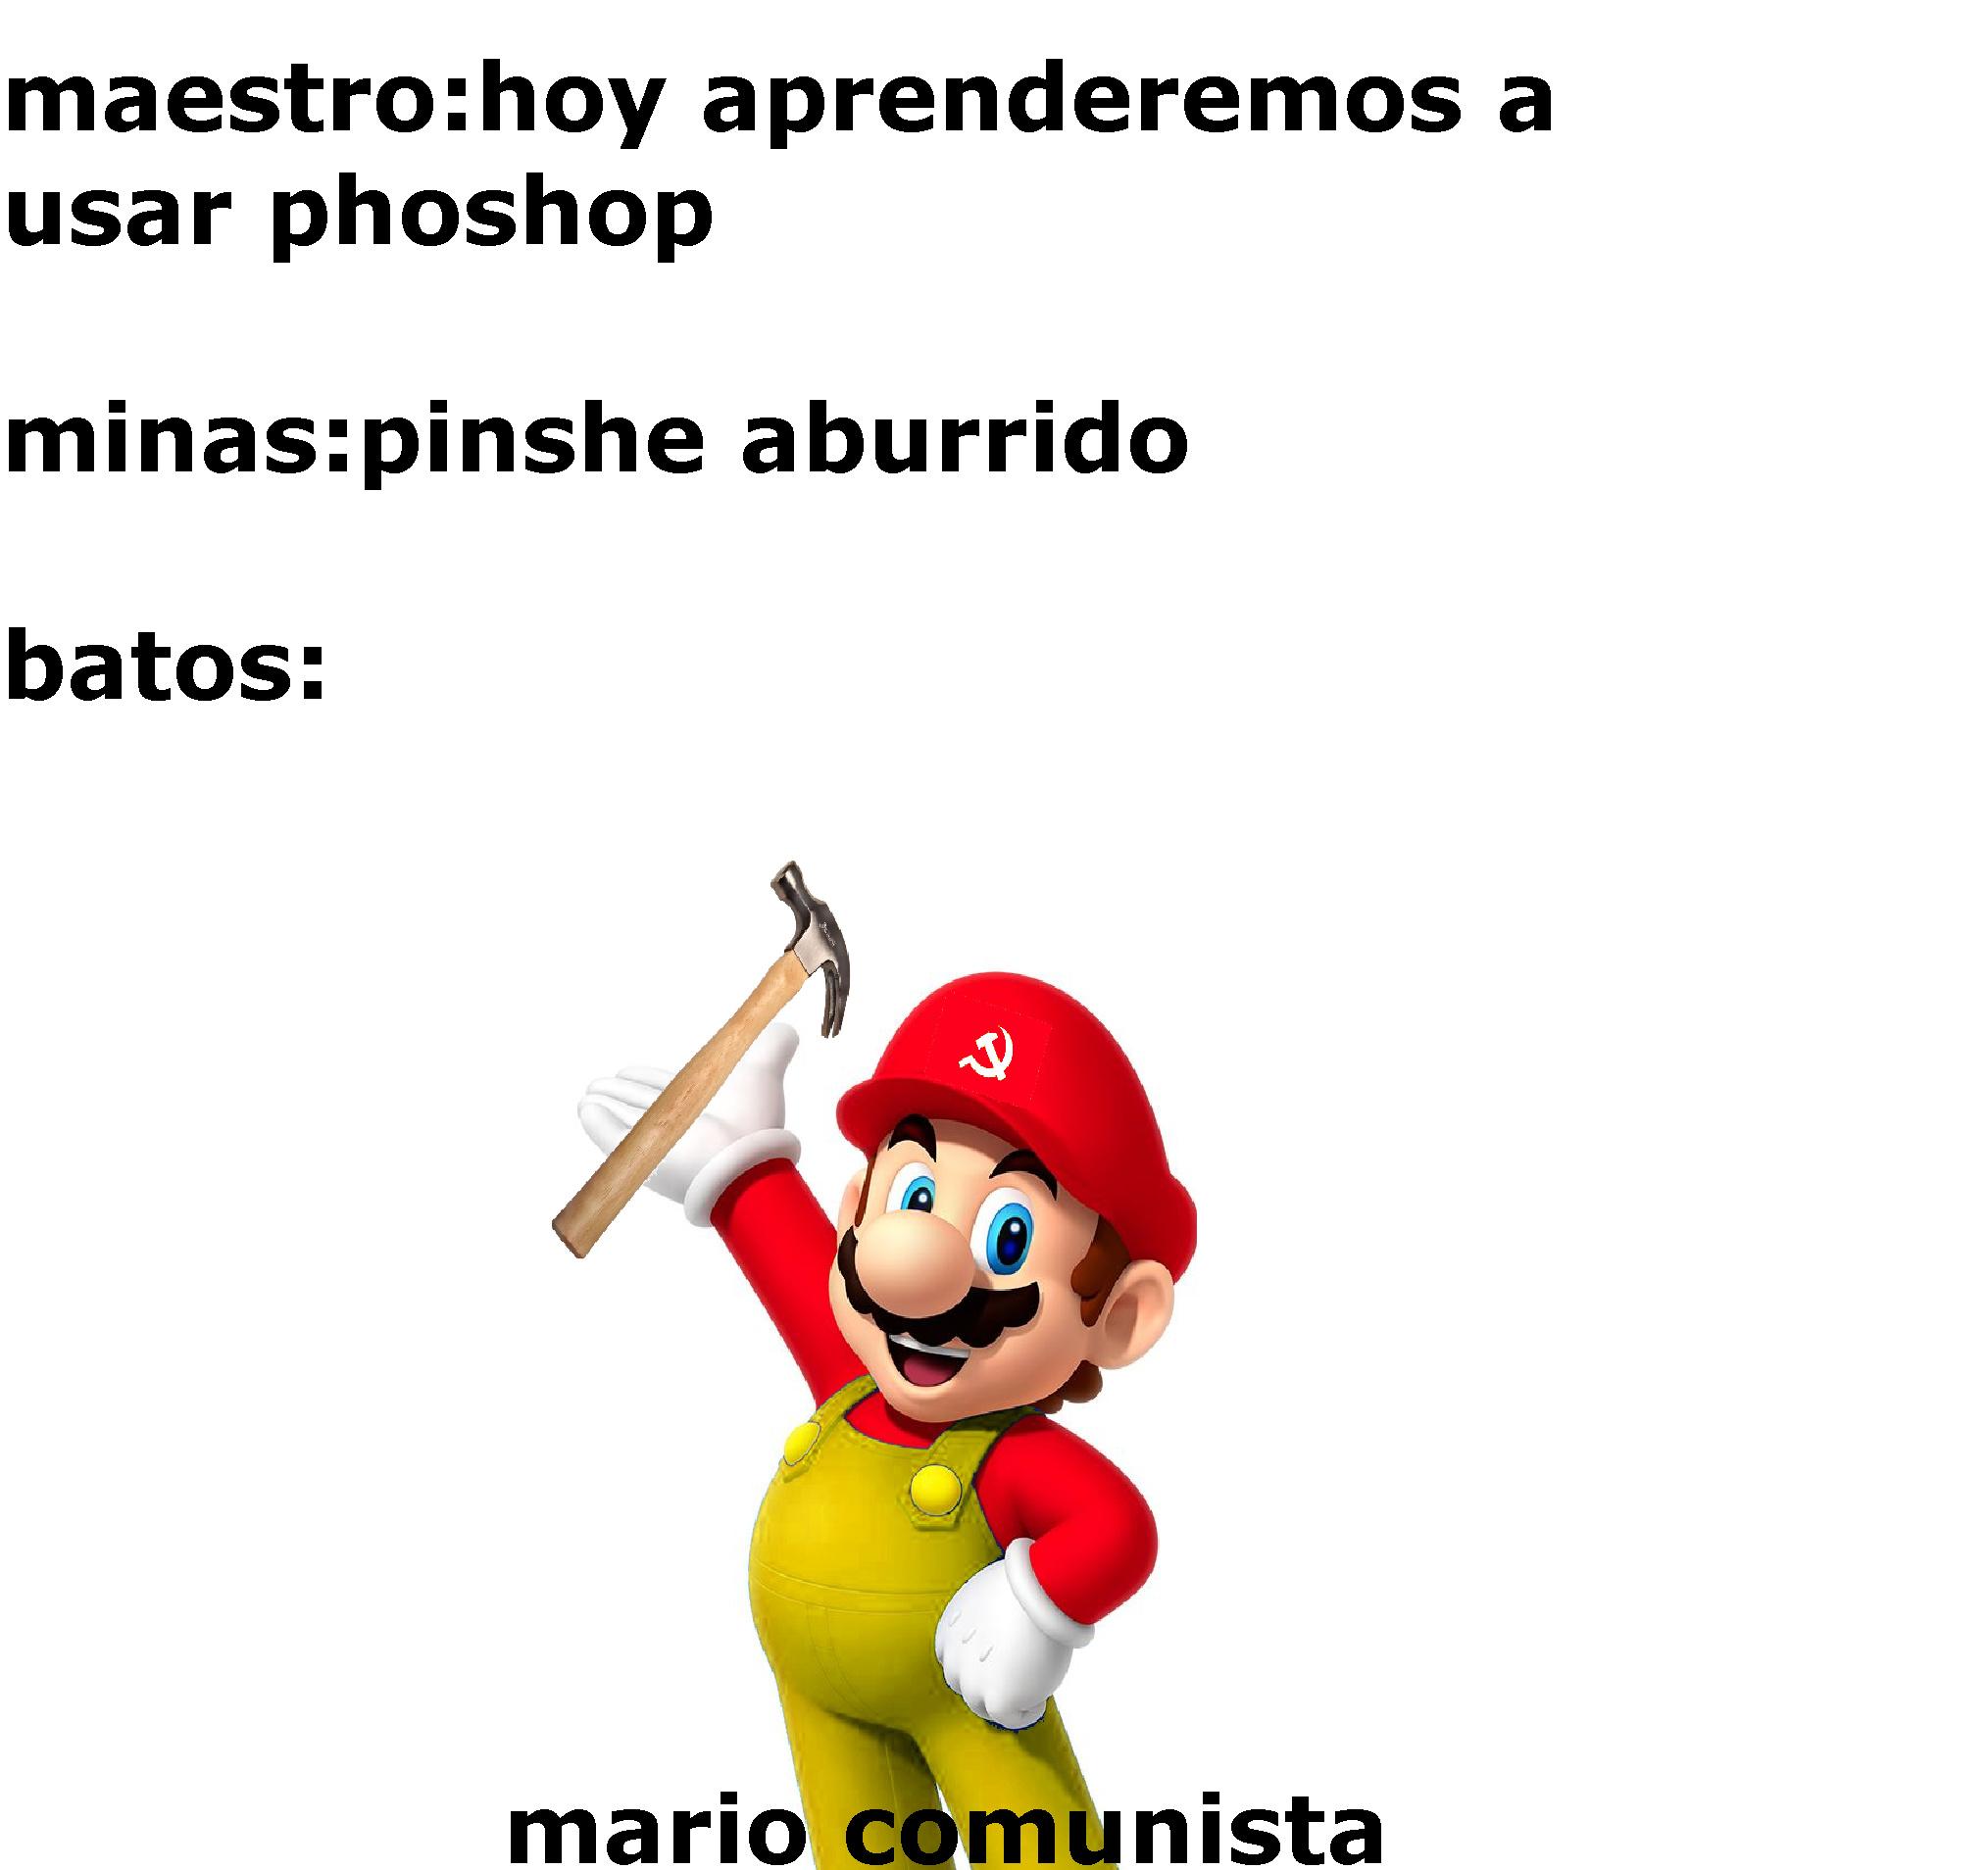 *suena himno soviético - meme